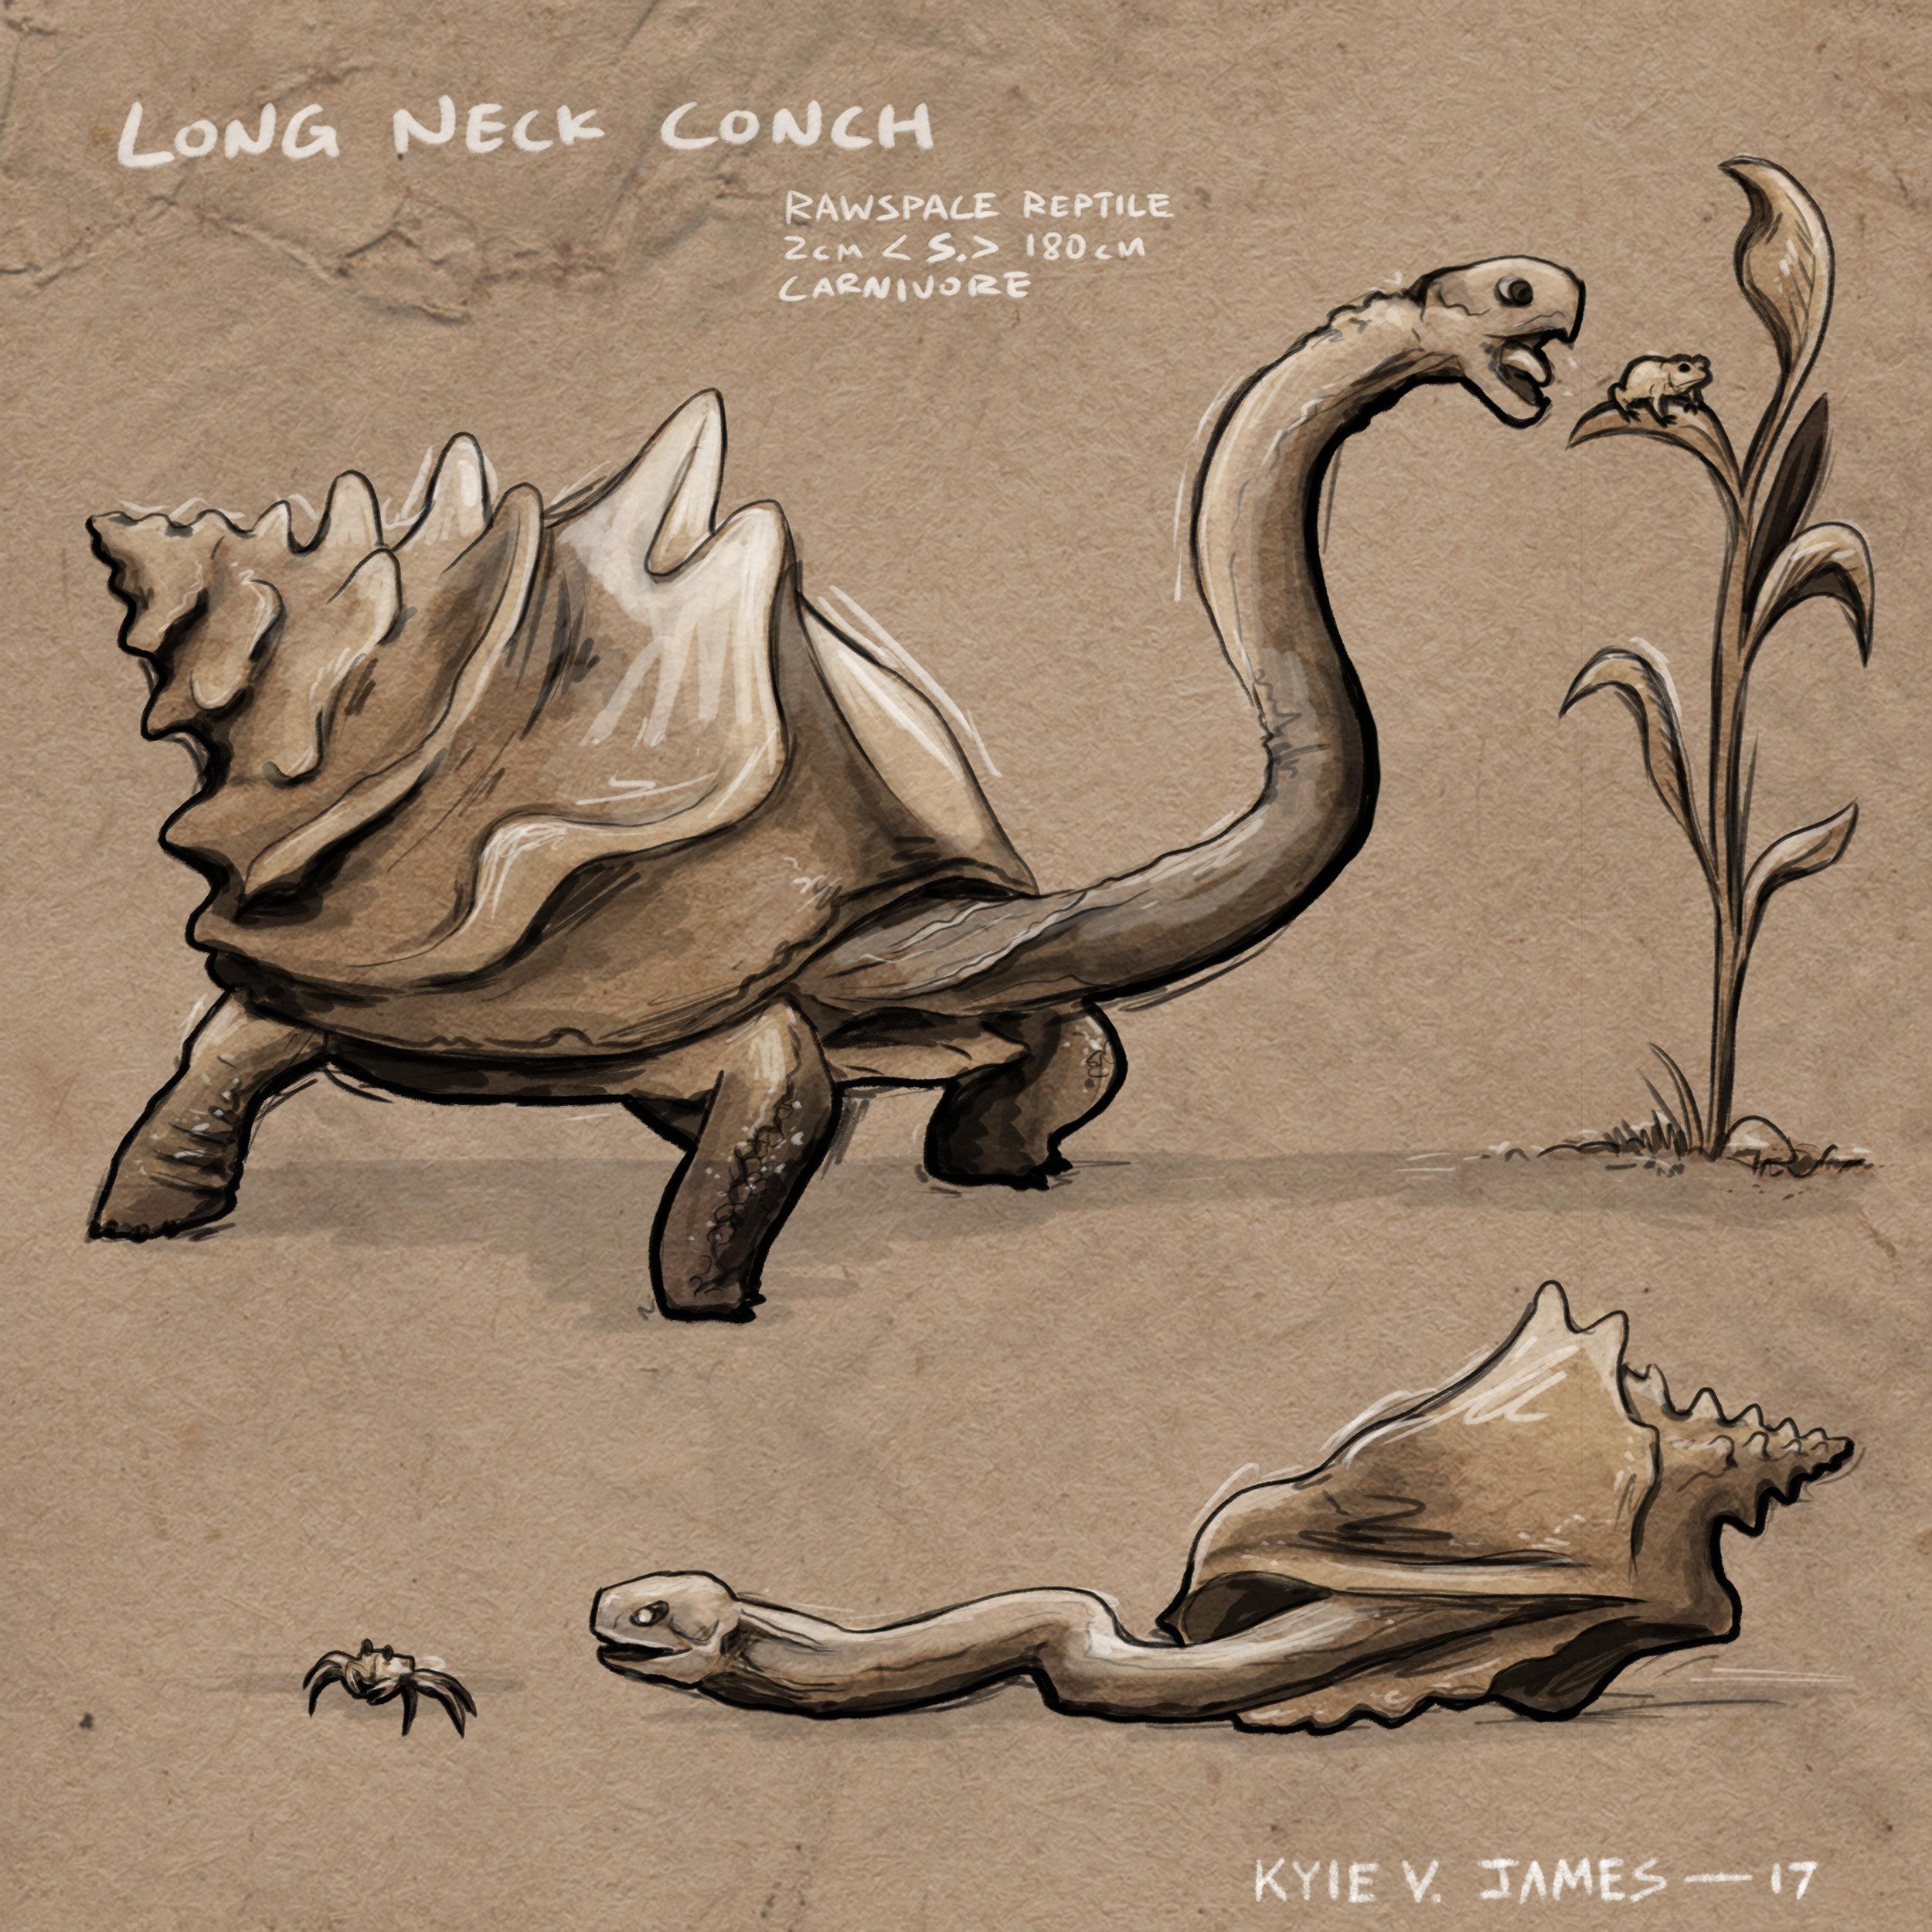 17-7-29 Turtle conch 1.jpg